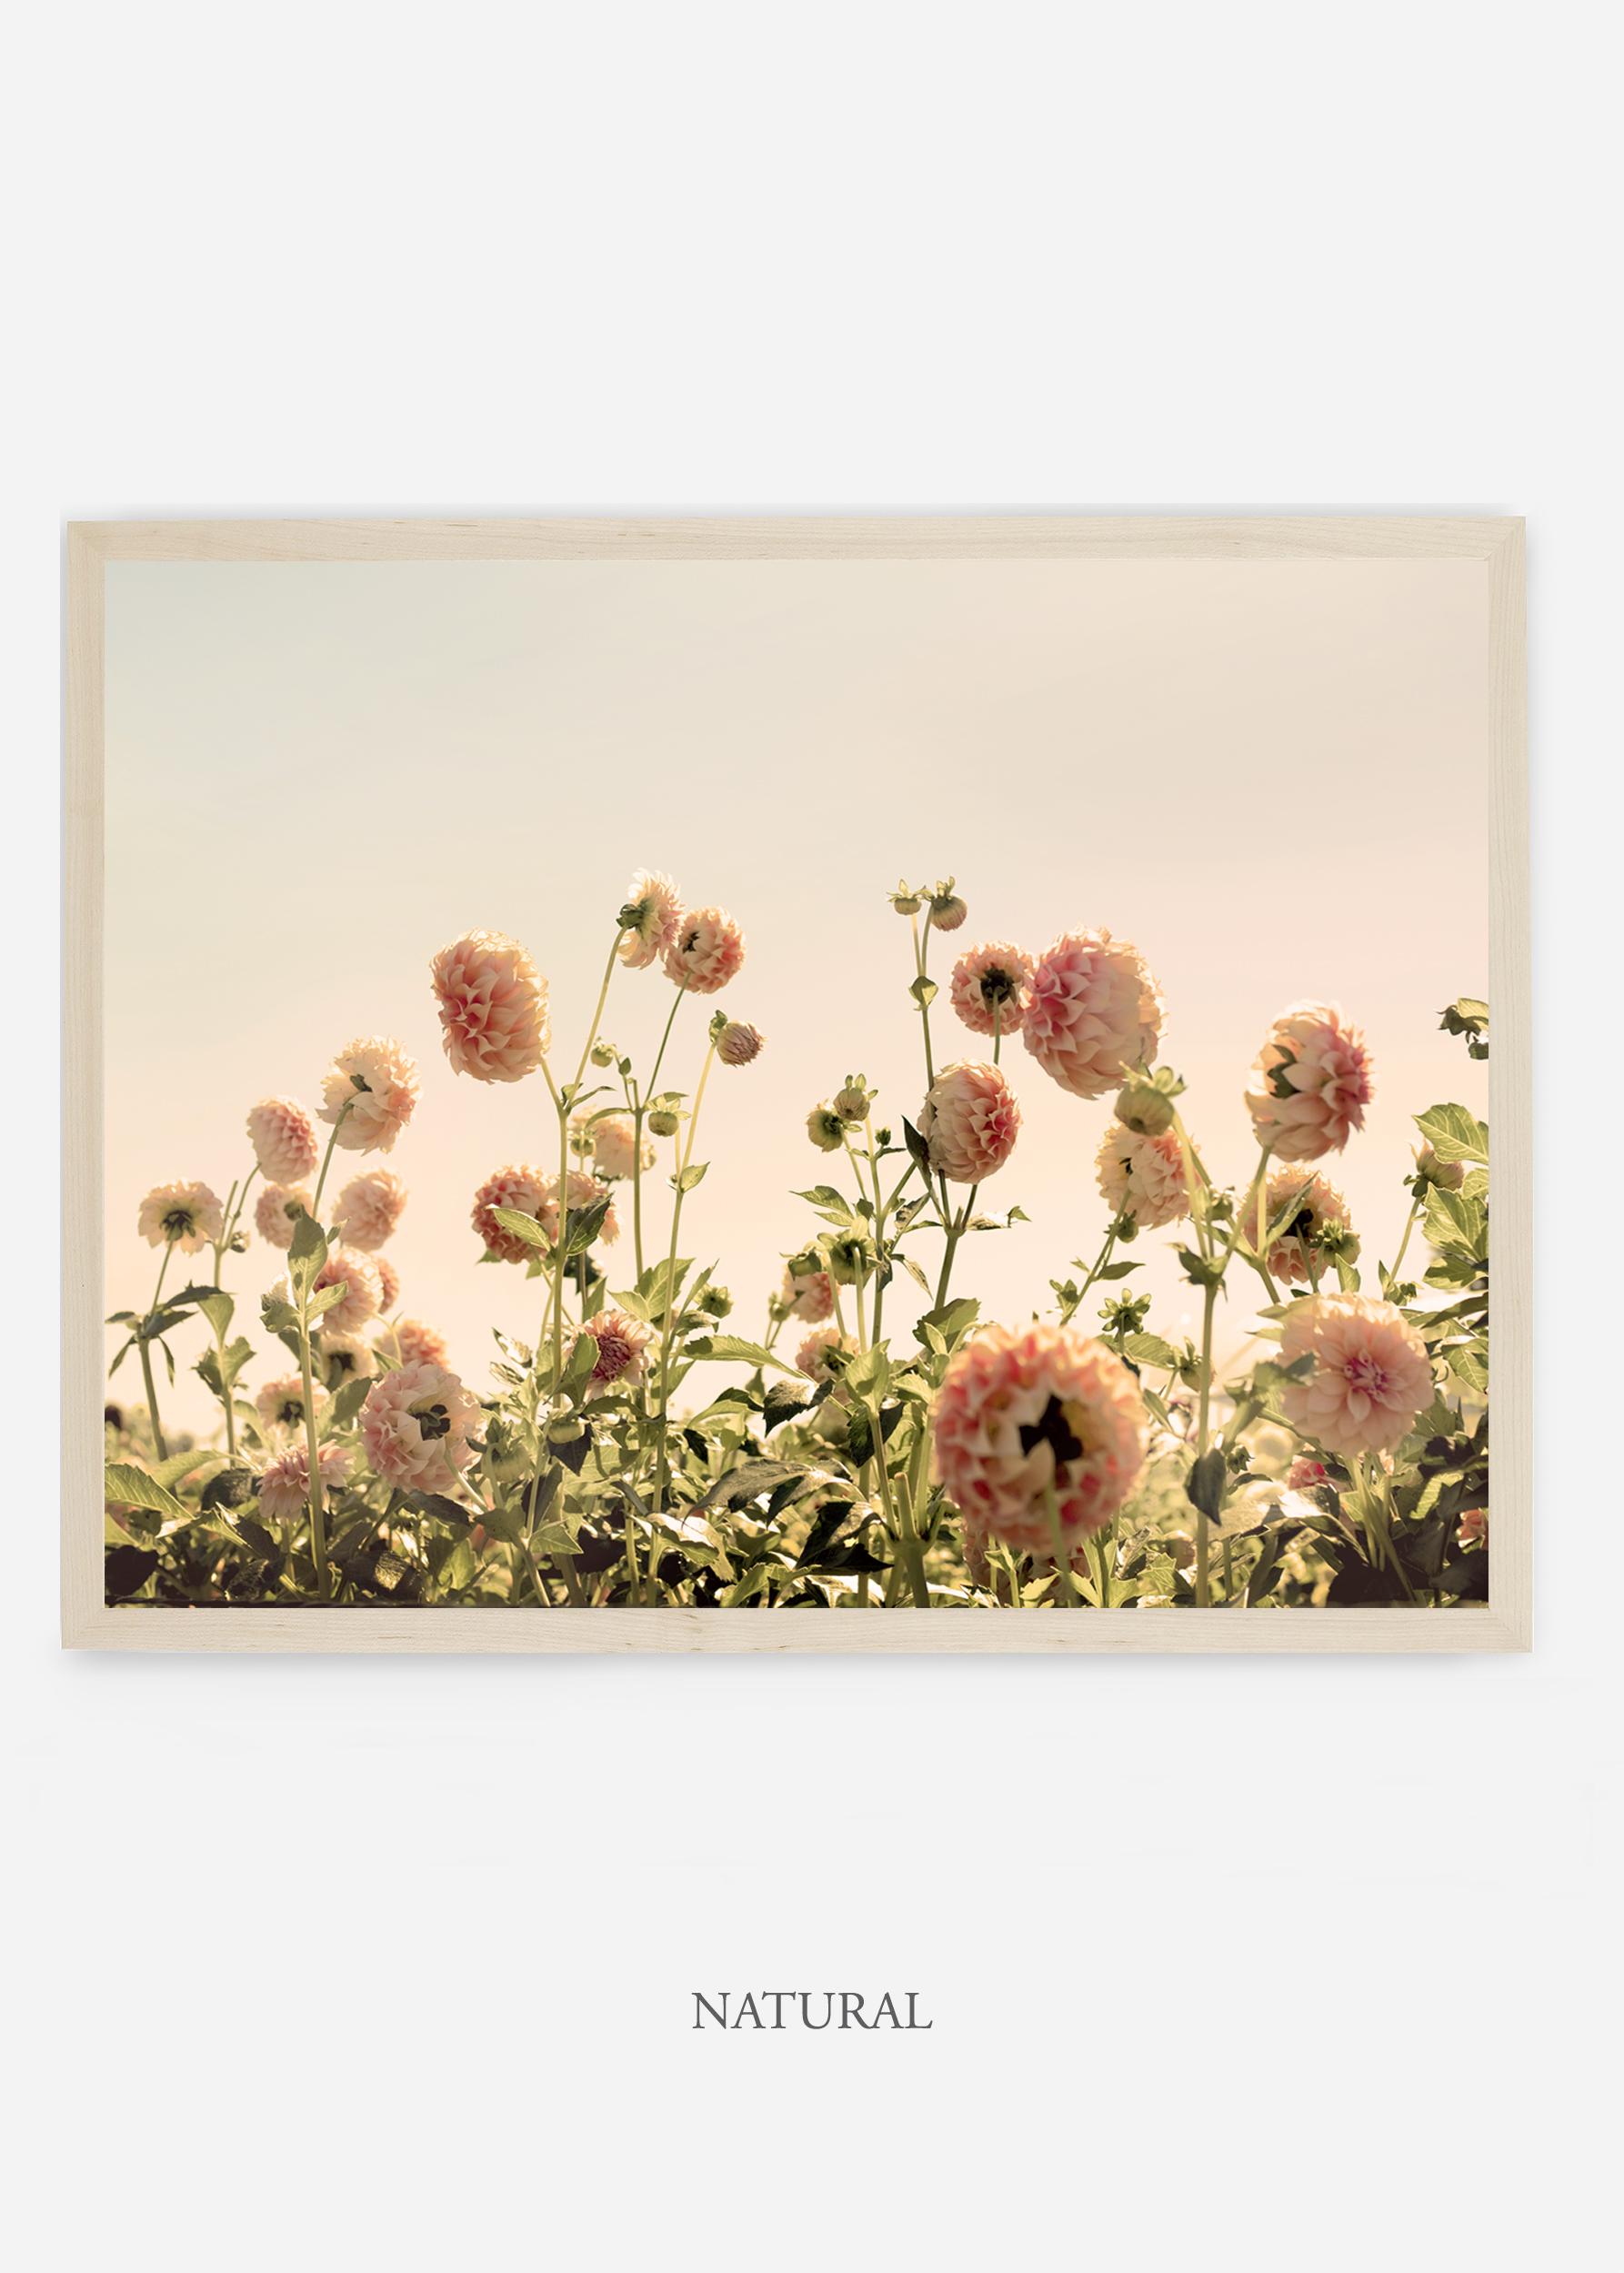 NoMat_NaturalFrame_DahliaNo.1_WilderCalifornia_Art_Floral_Homedecor_Prints_Dahlia_Botanical_Artwork_Interiordesign.jpg